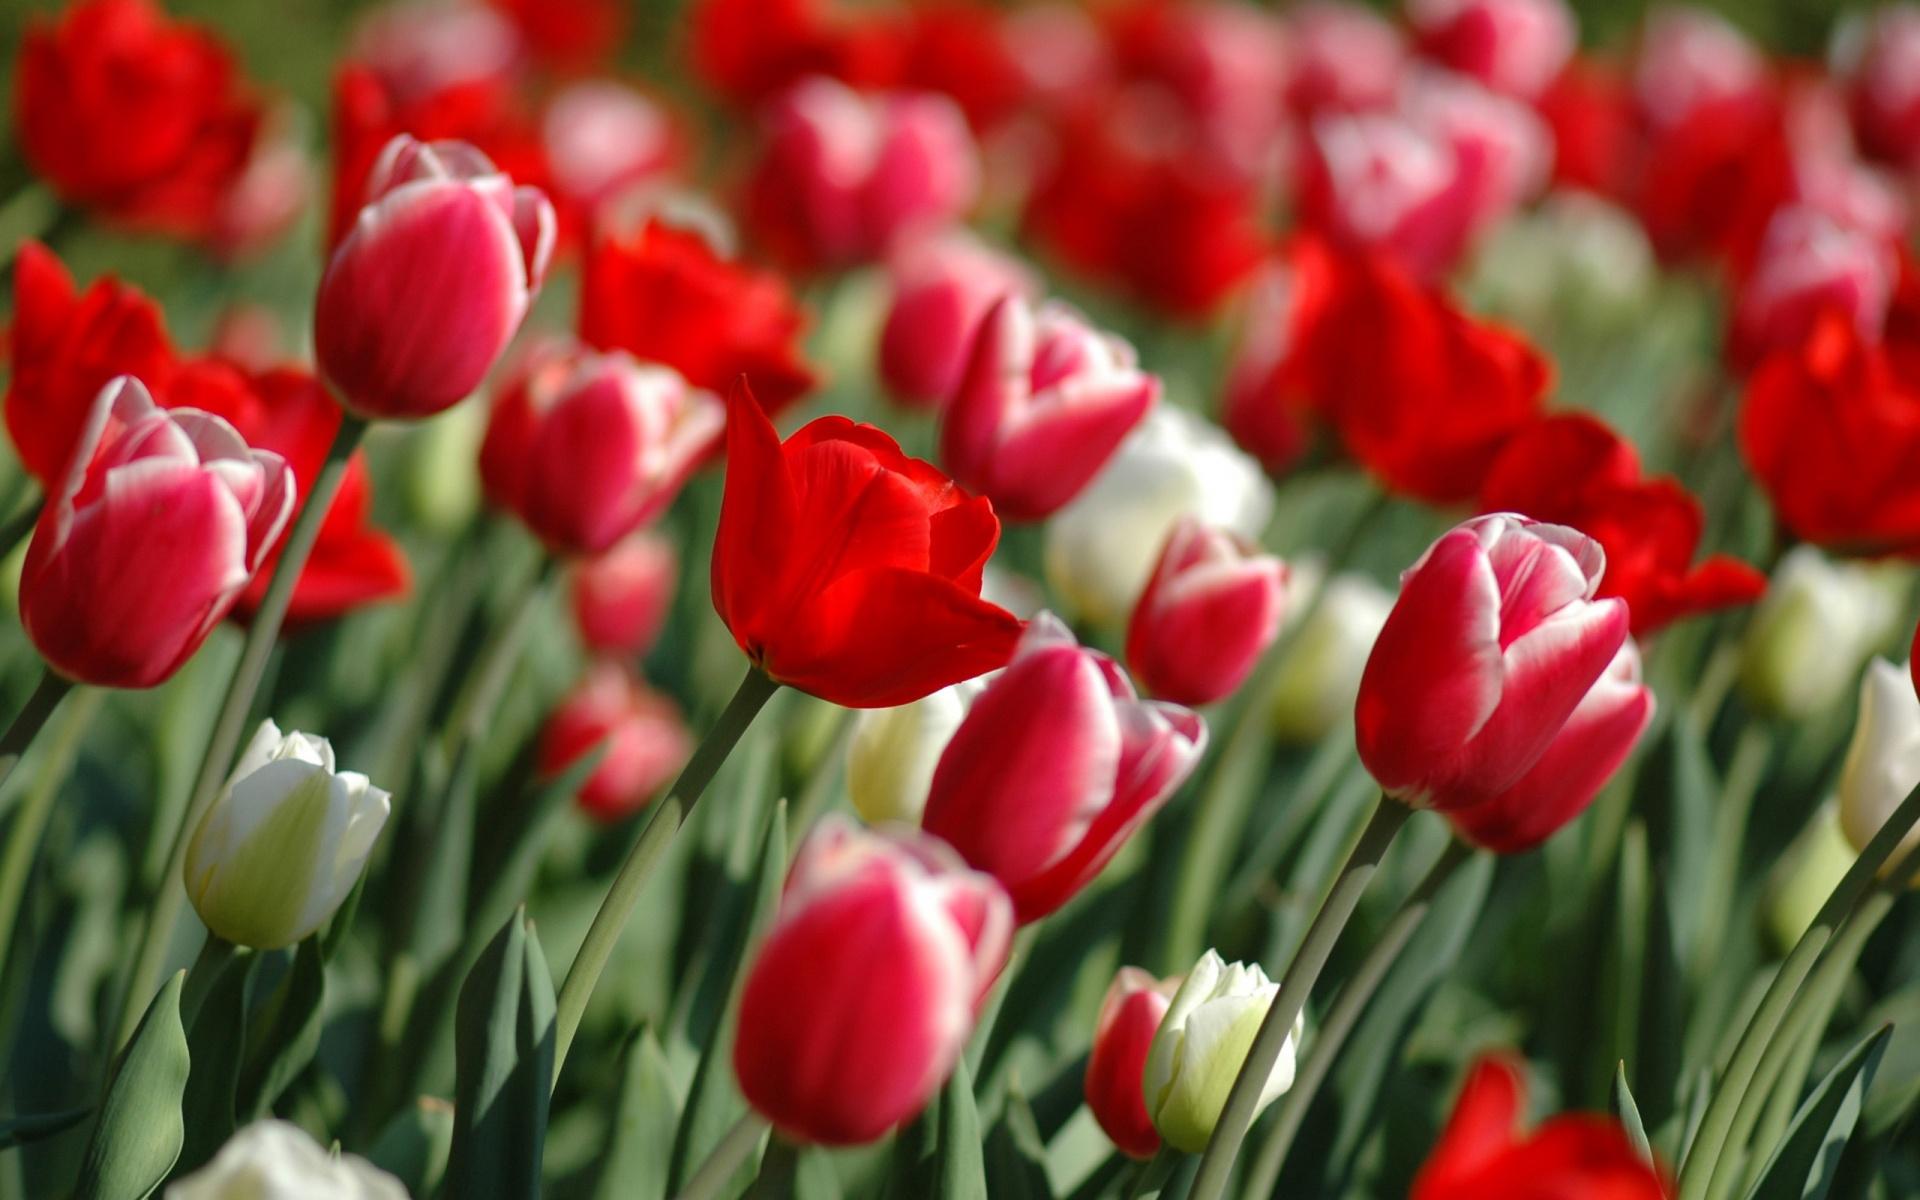 Wallpapers screensavers wallpaper flowers tulips download spring